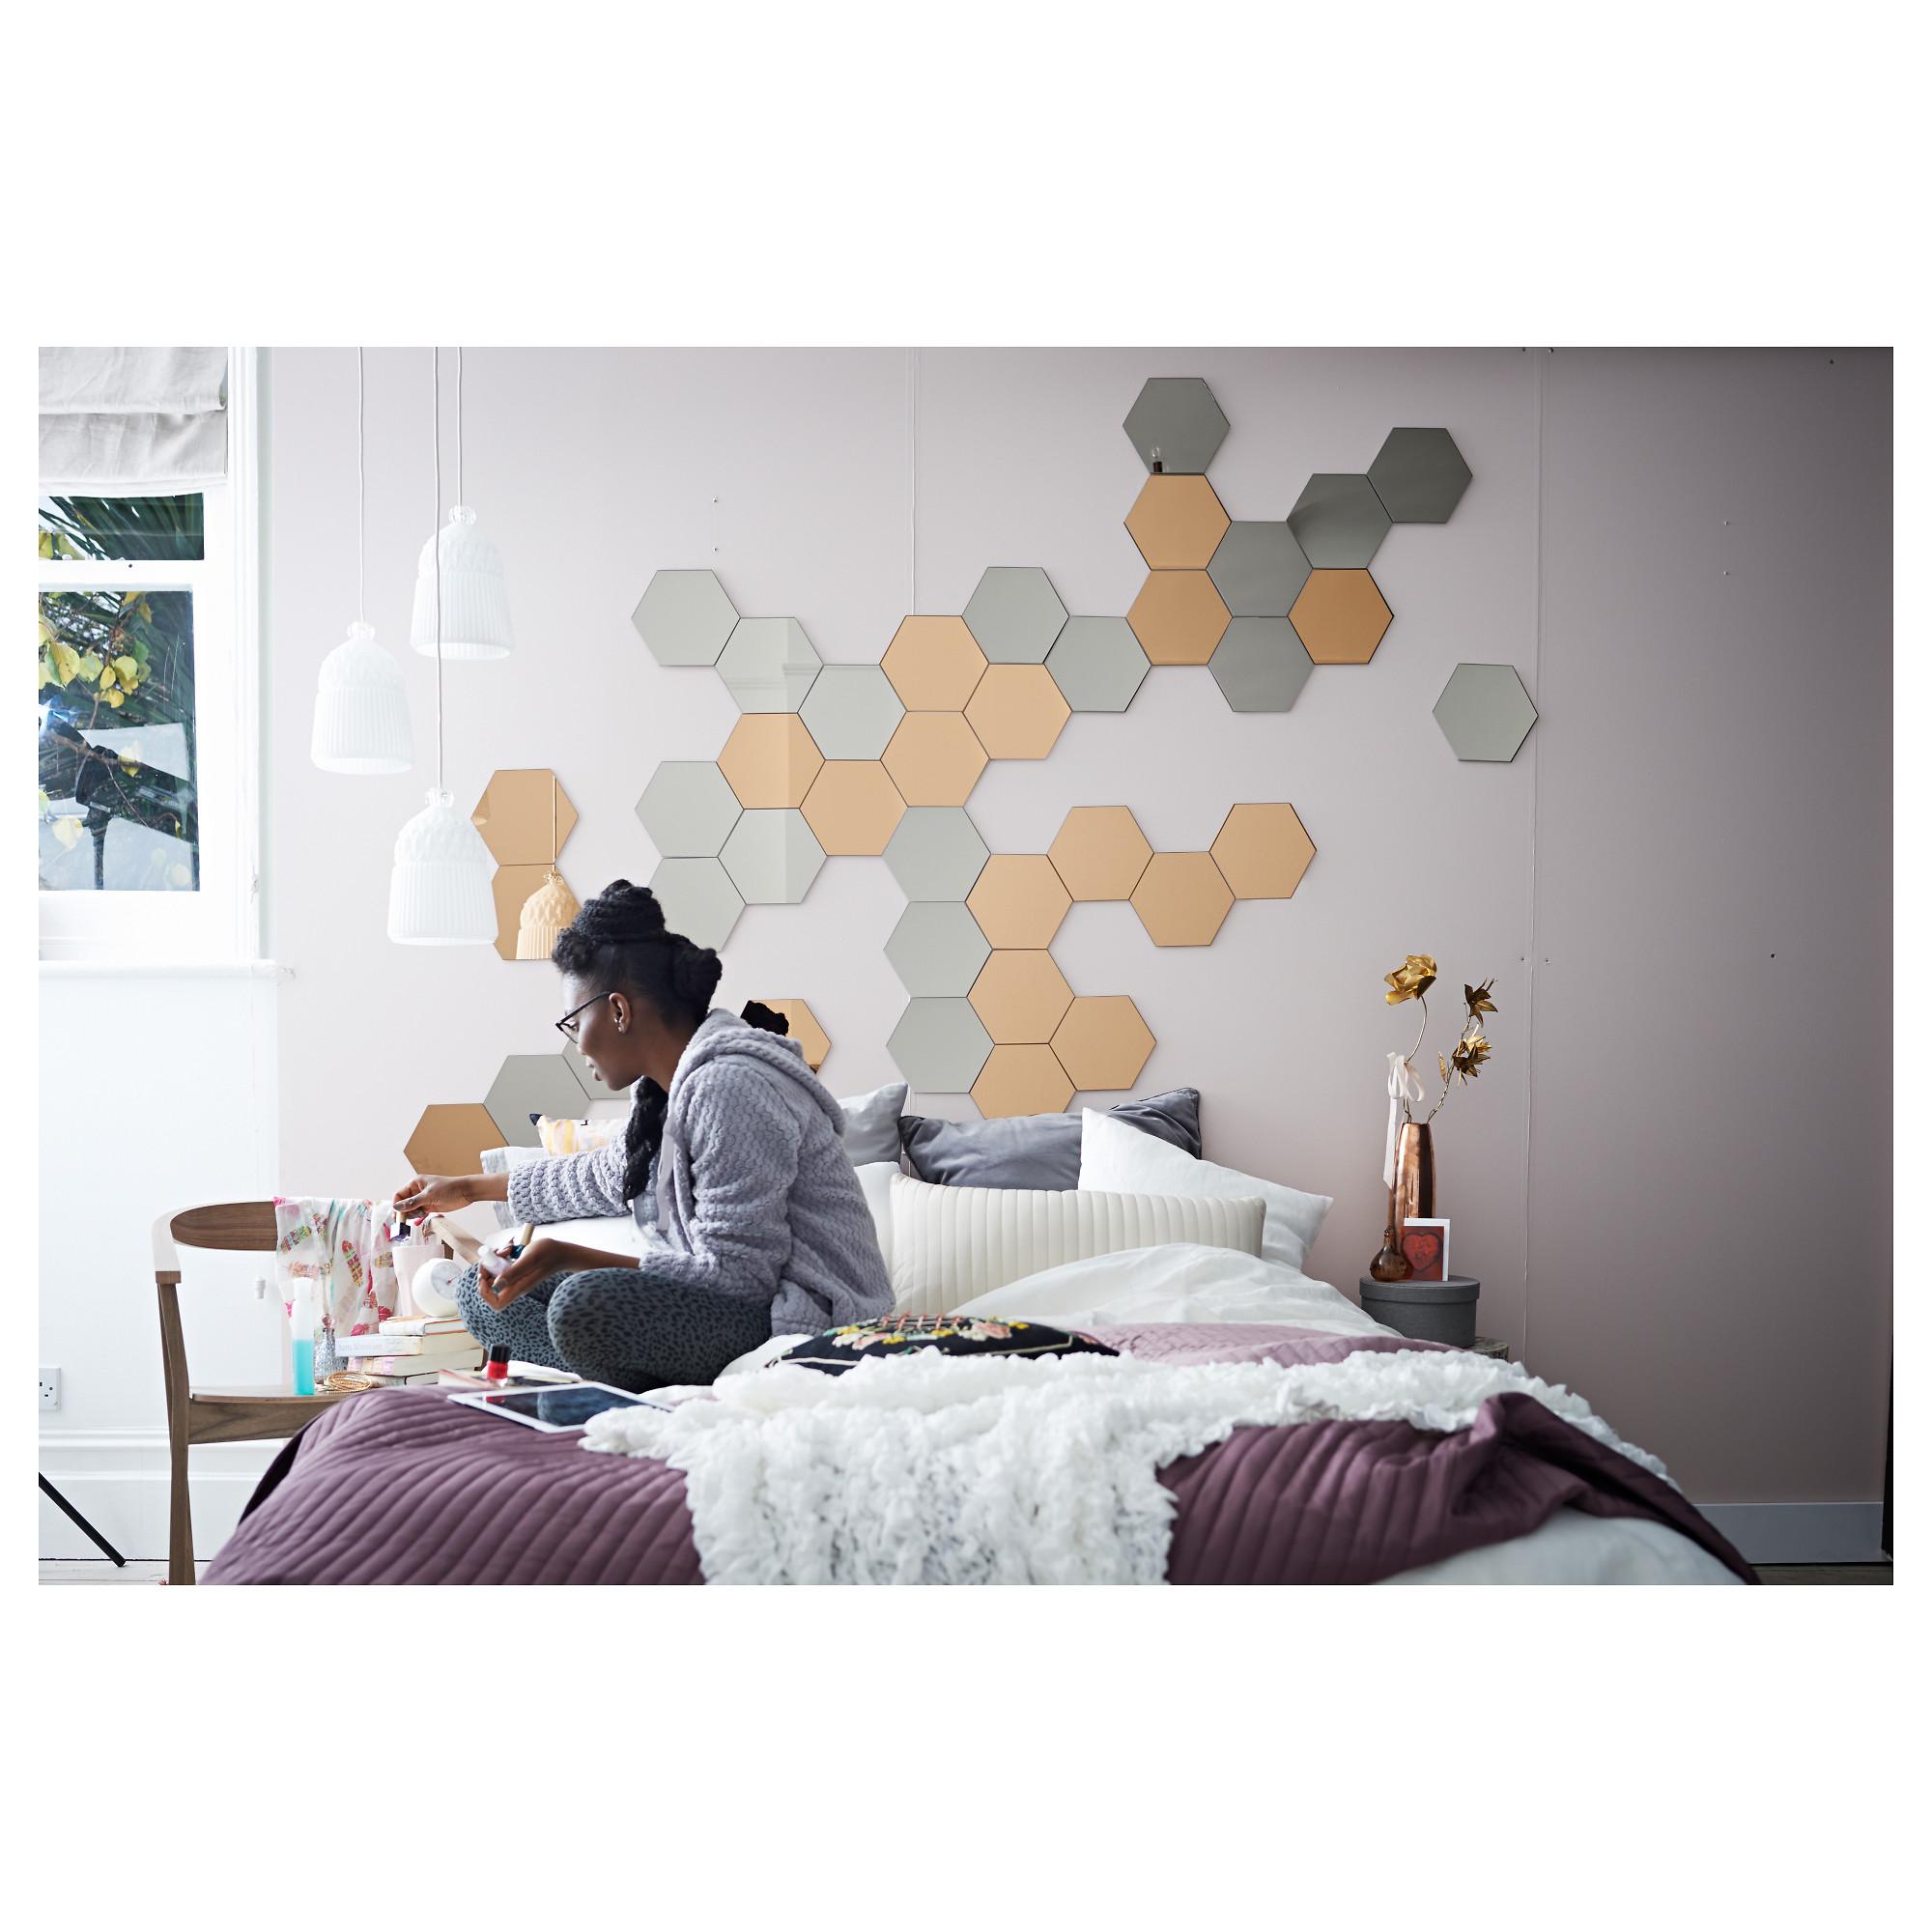 IKEA Latvia - Shop for Furniture, Lighting, Home ...